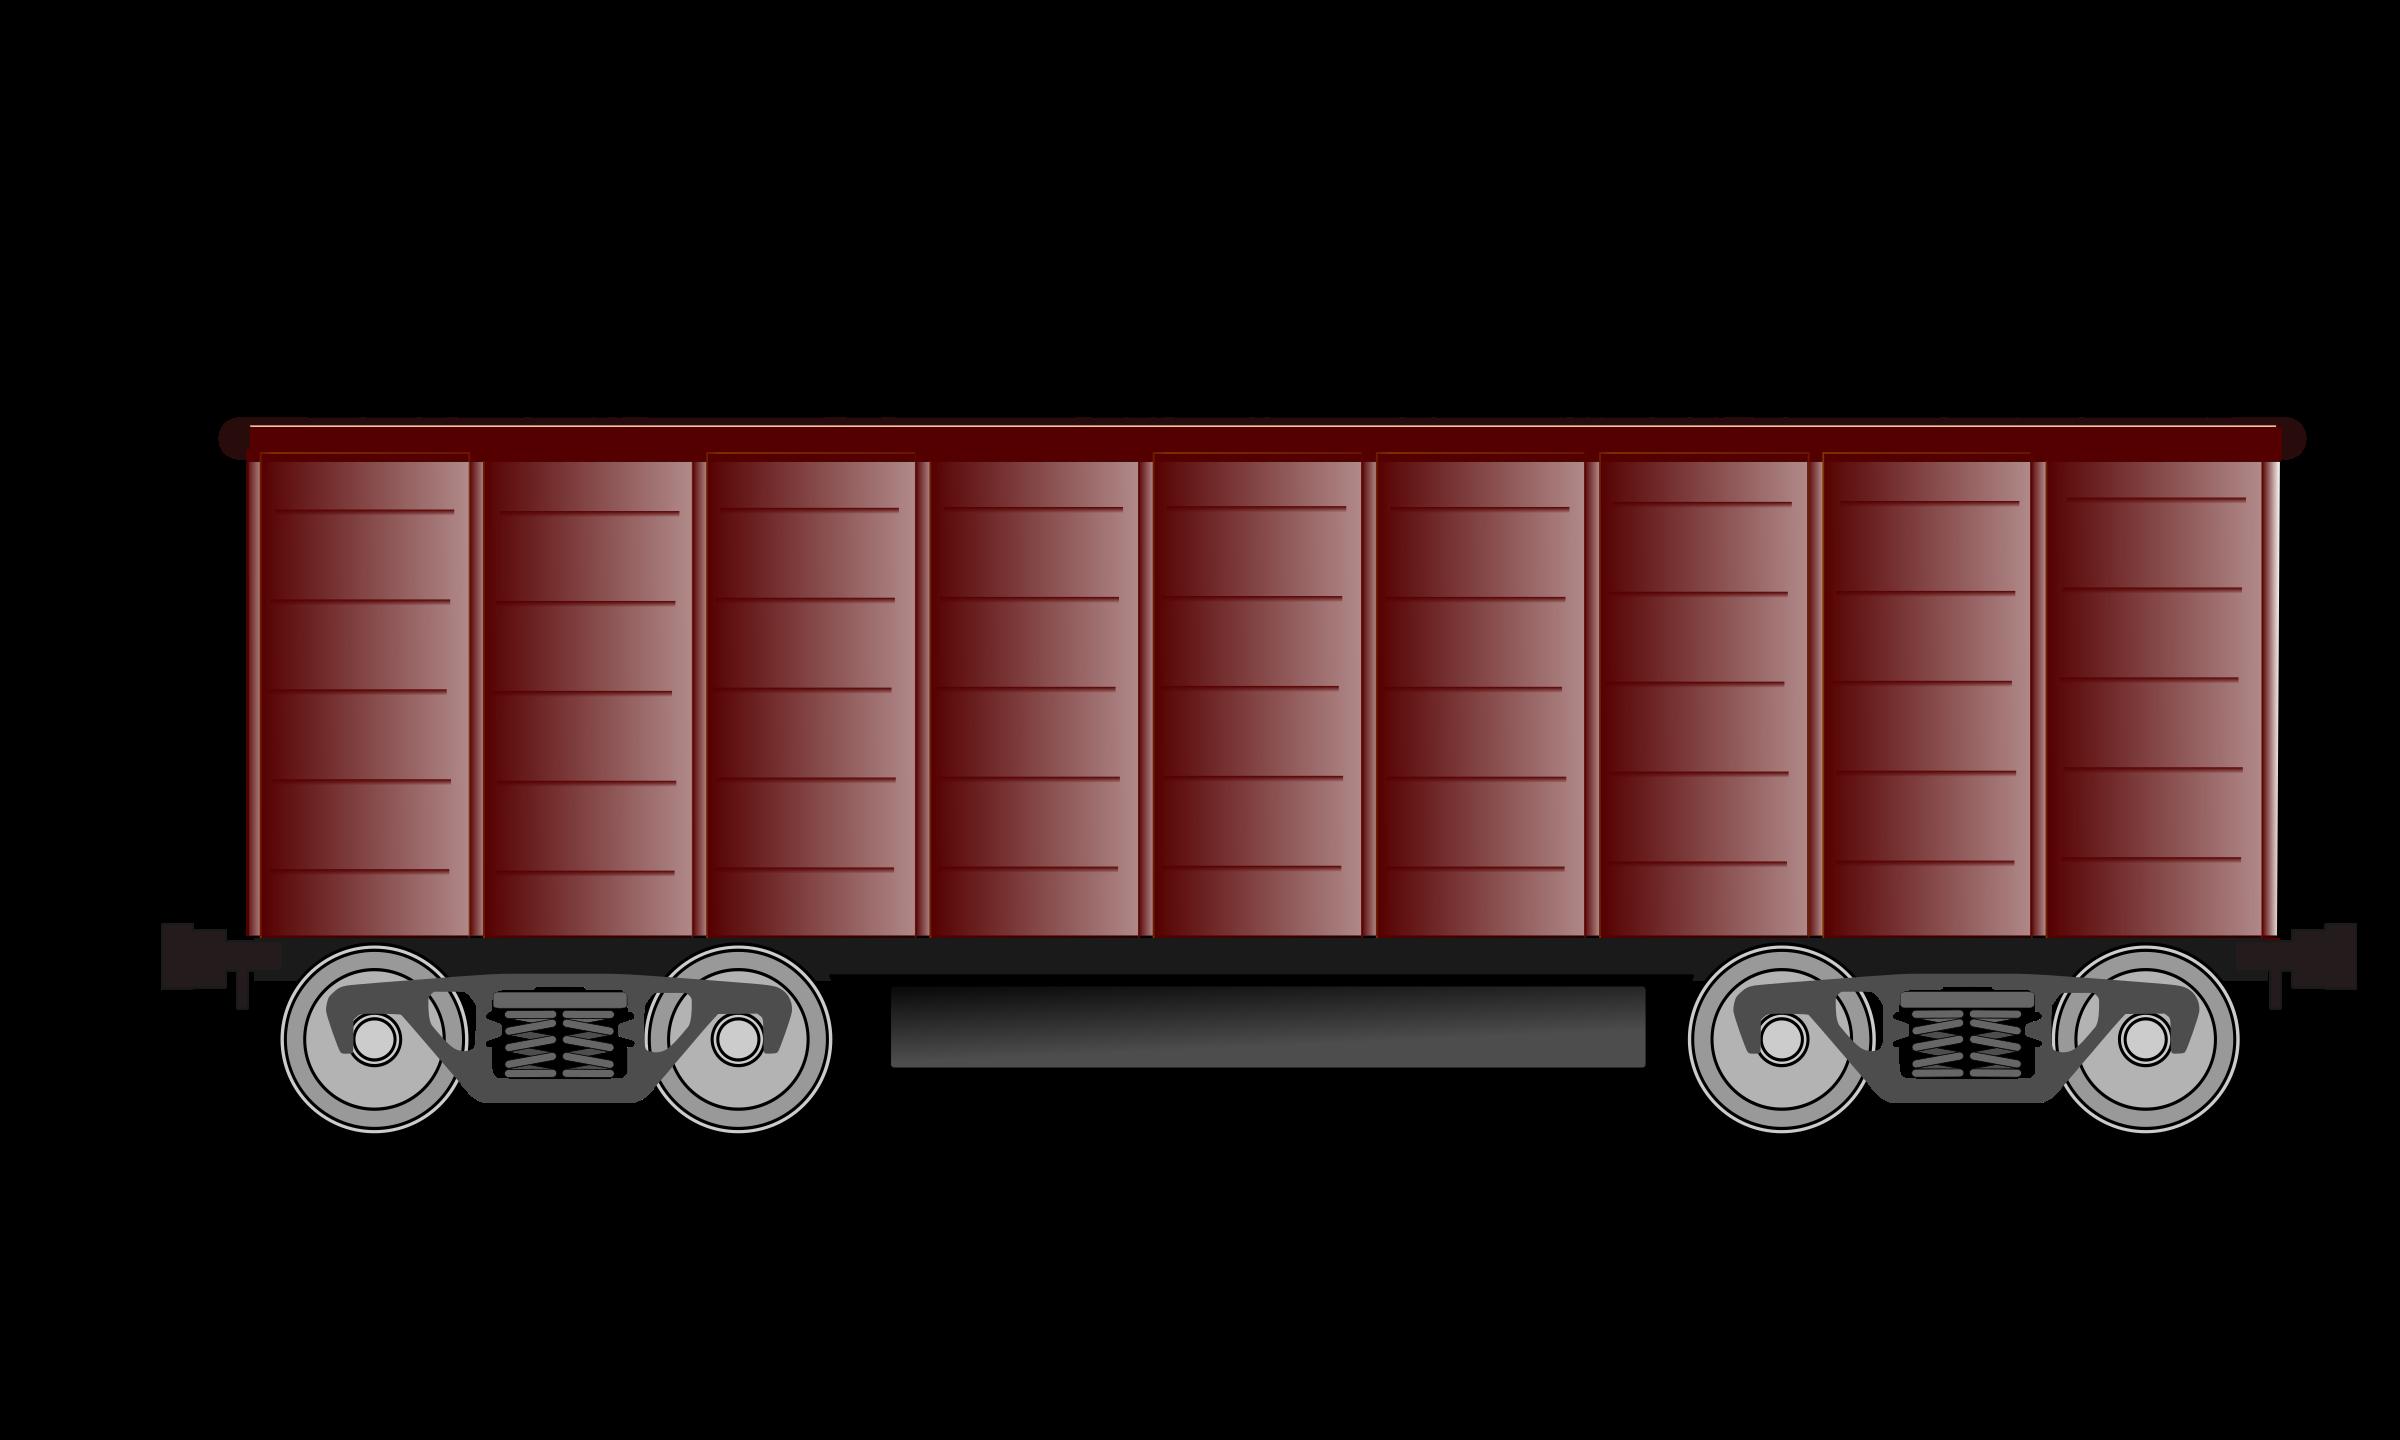 Coal car clipart image stock Clipart - Coal wagon image stock